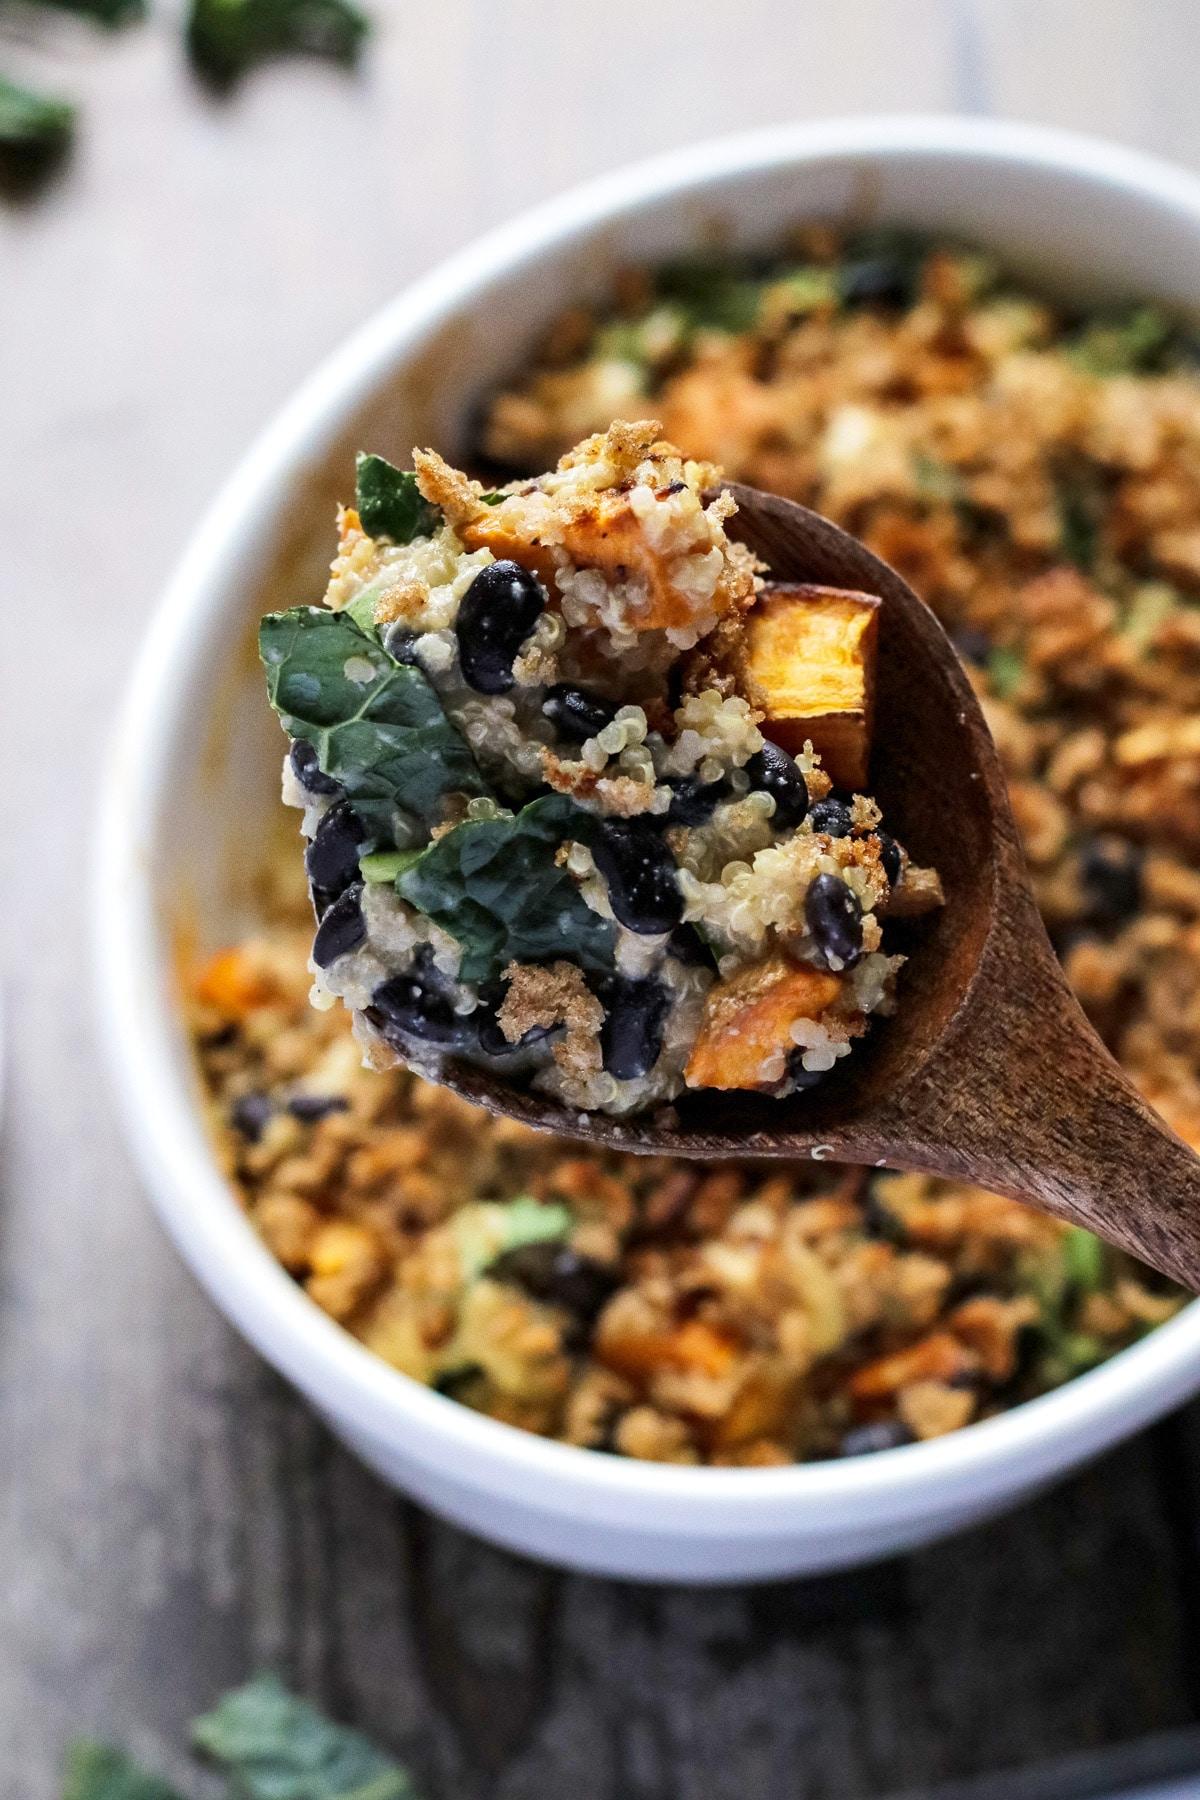 A spoonful of vegan sweet potato casserole.